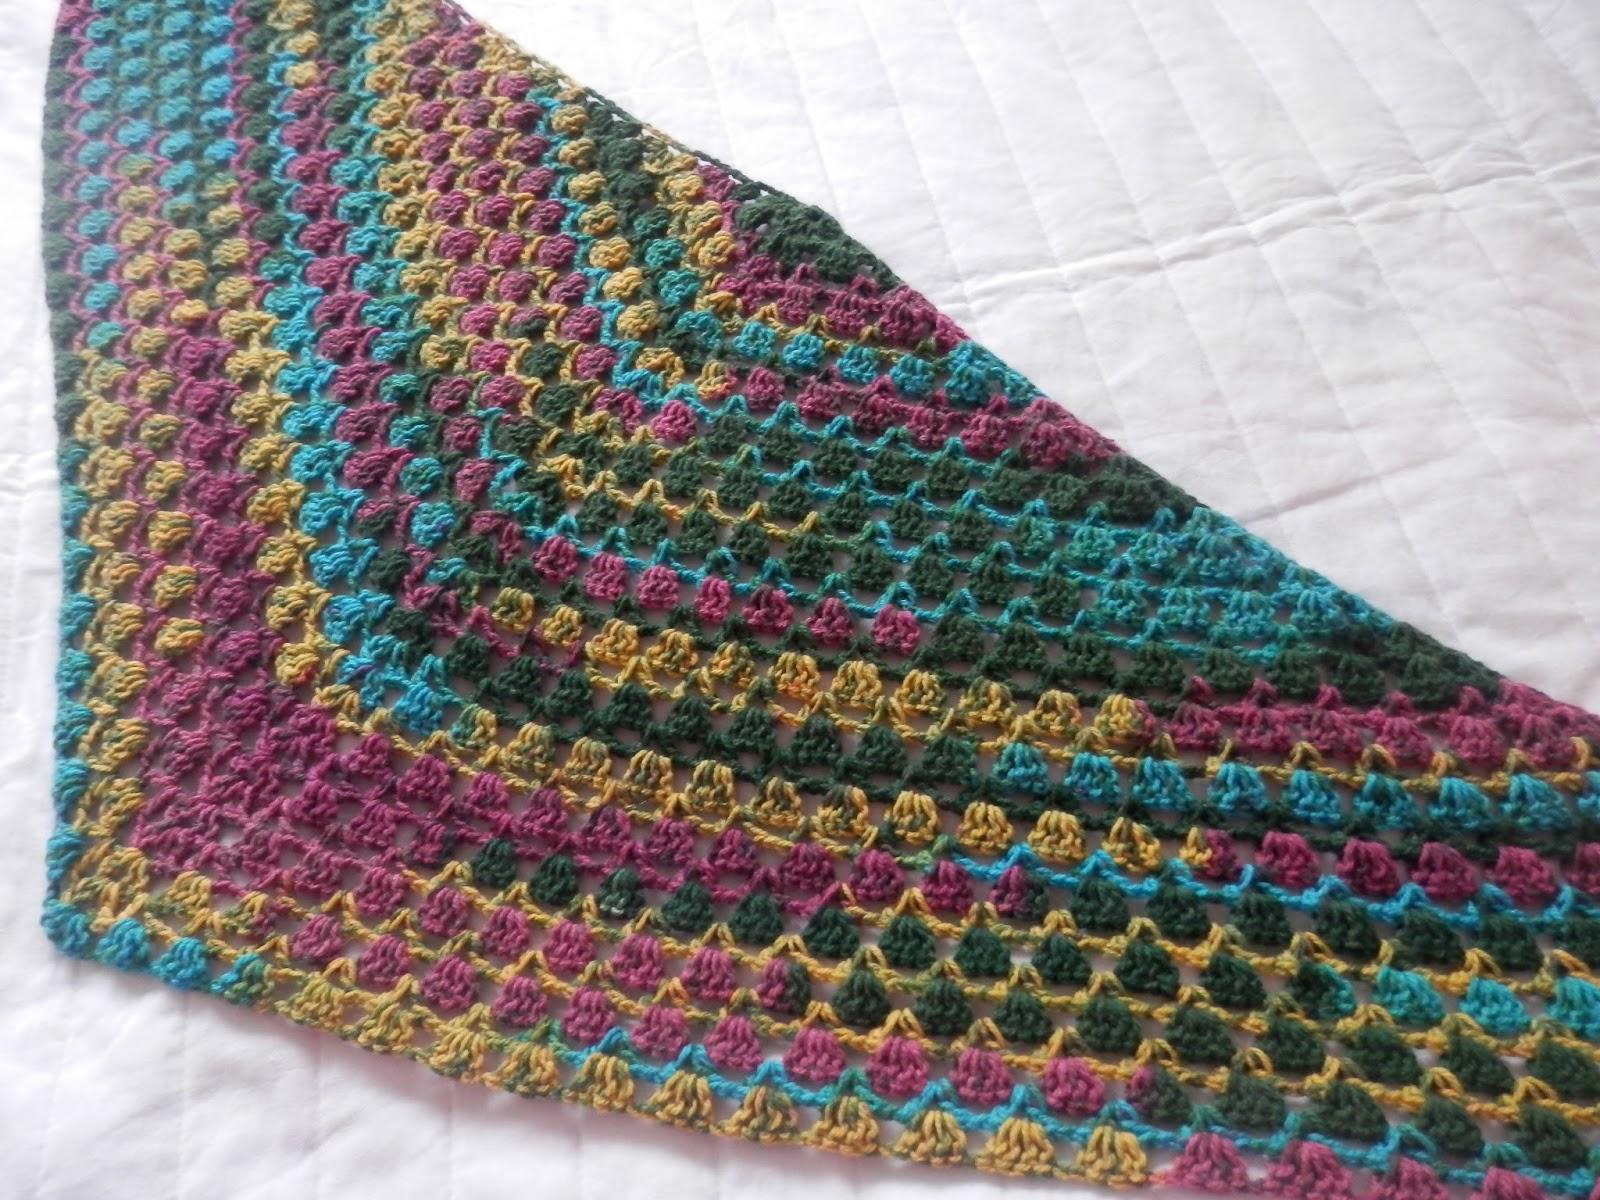 Funky Crochet Afghan Patterns Using Variegated Yarn Images - Sewing ...